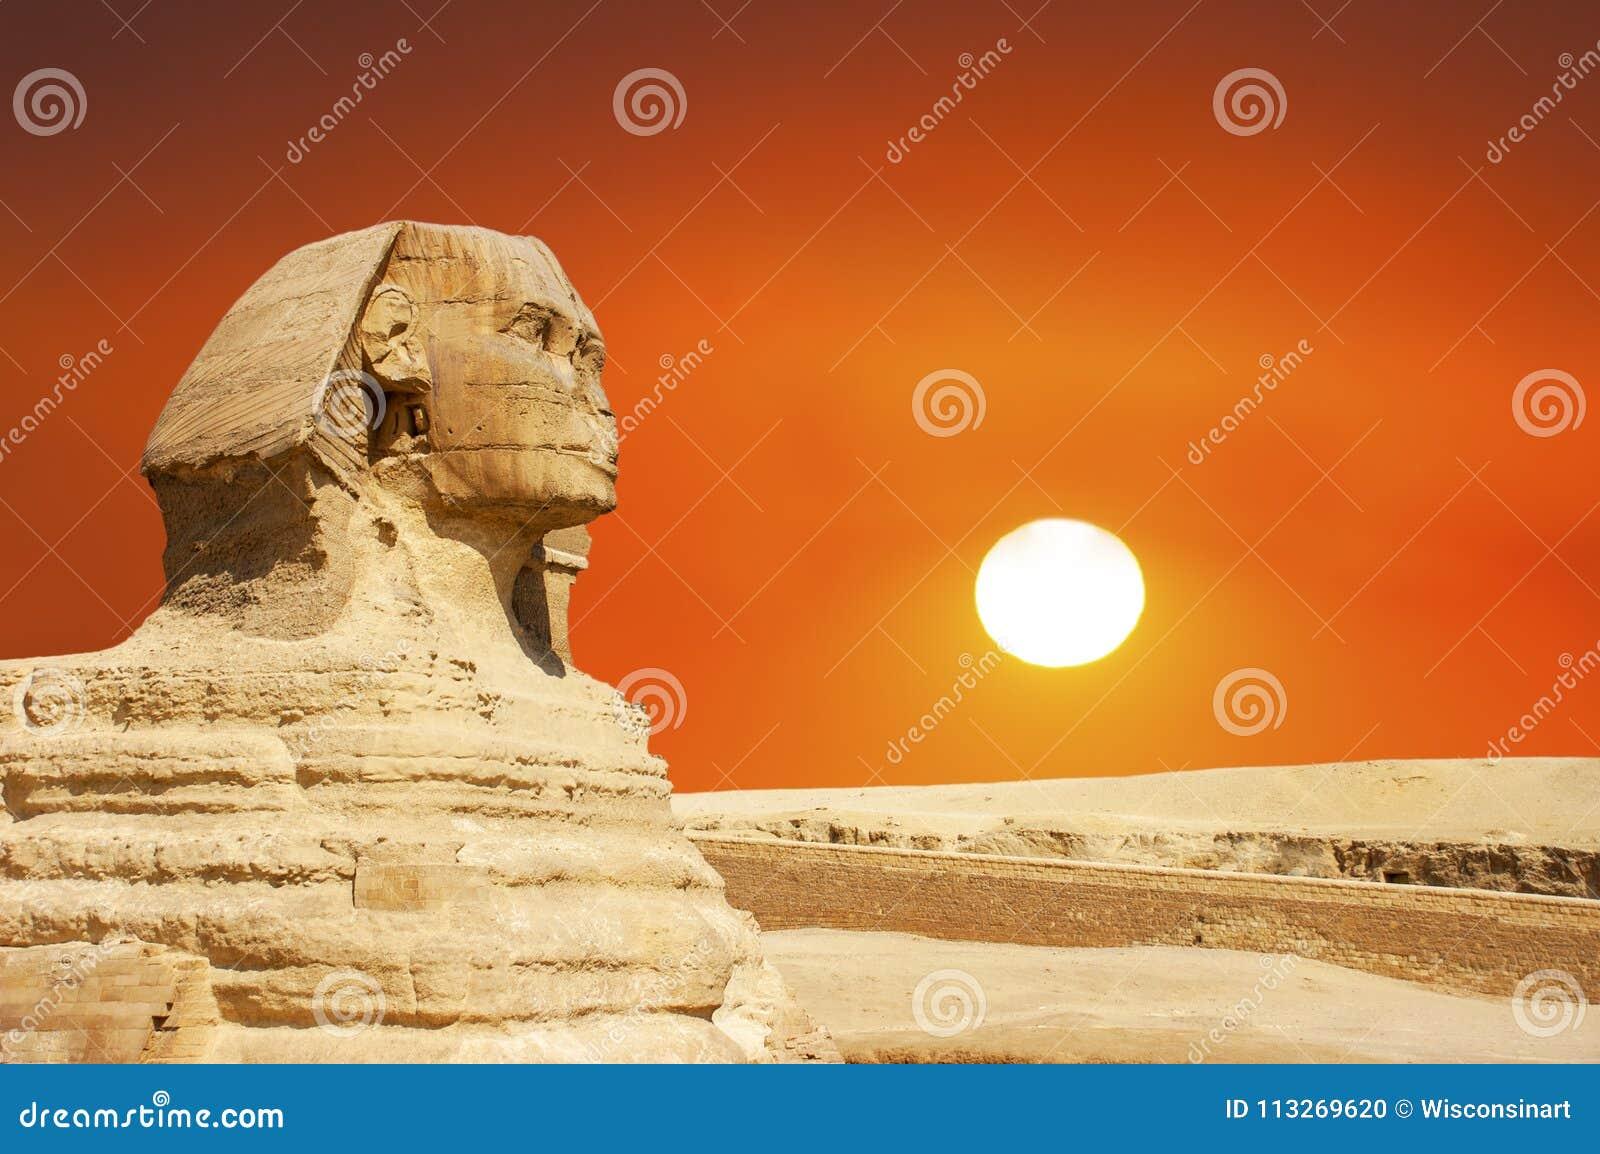 Sphinx, Giza, Cairo Egypt Travel, Sunrise, Sunset